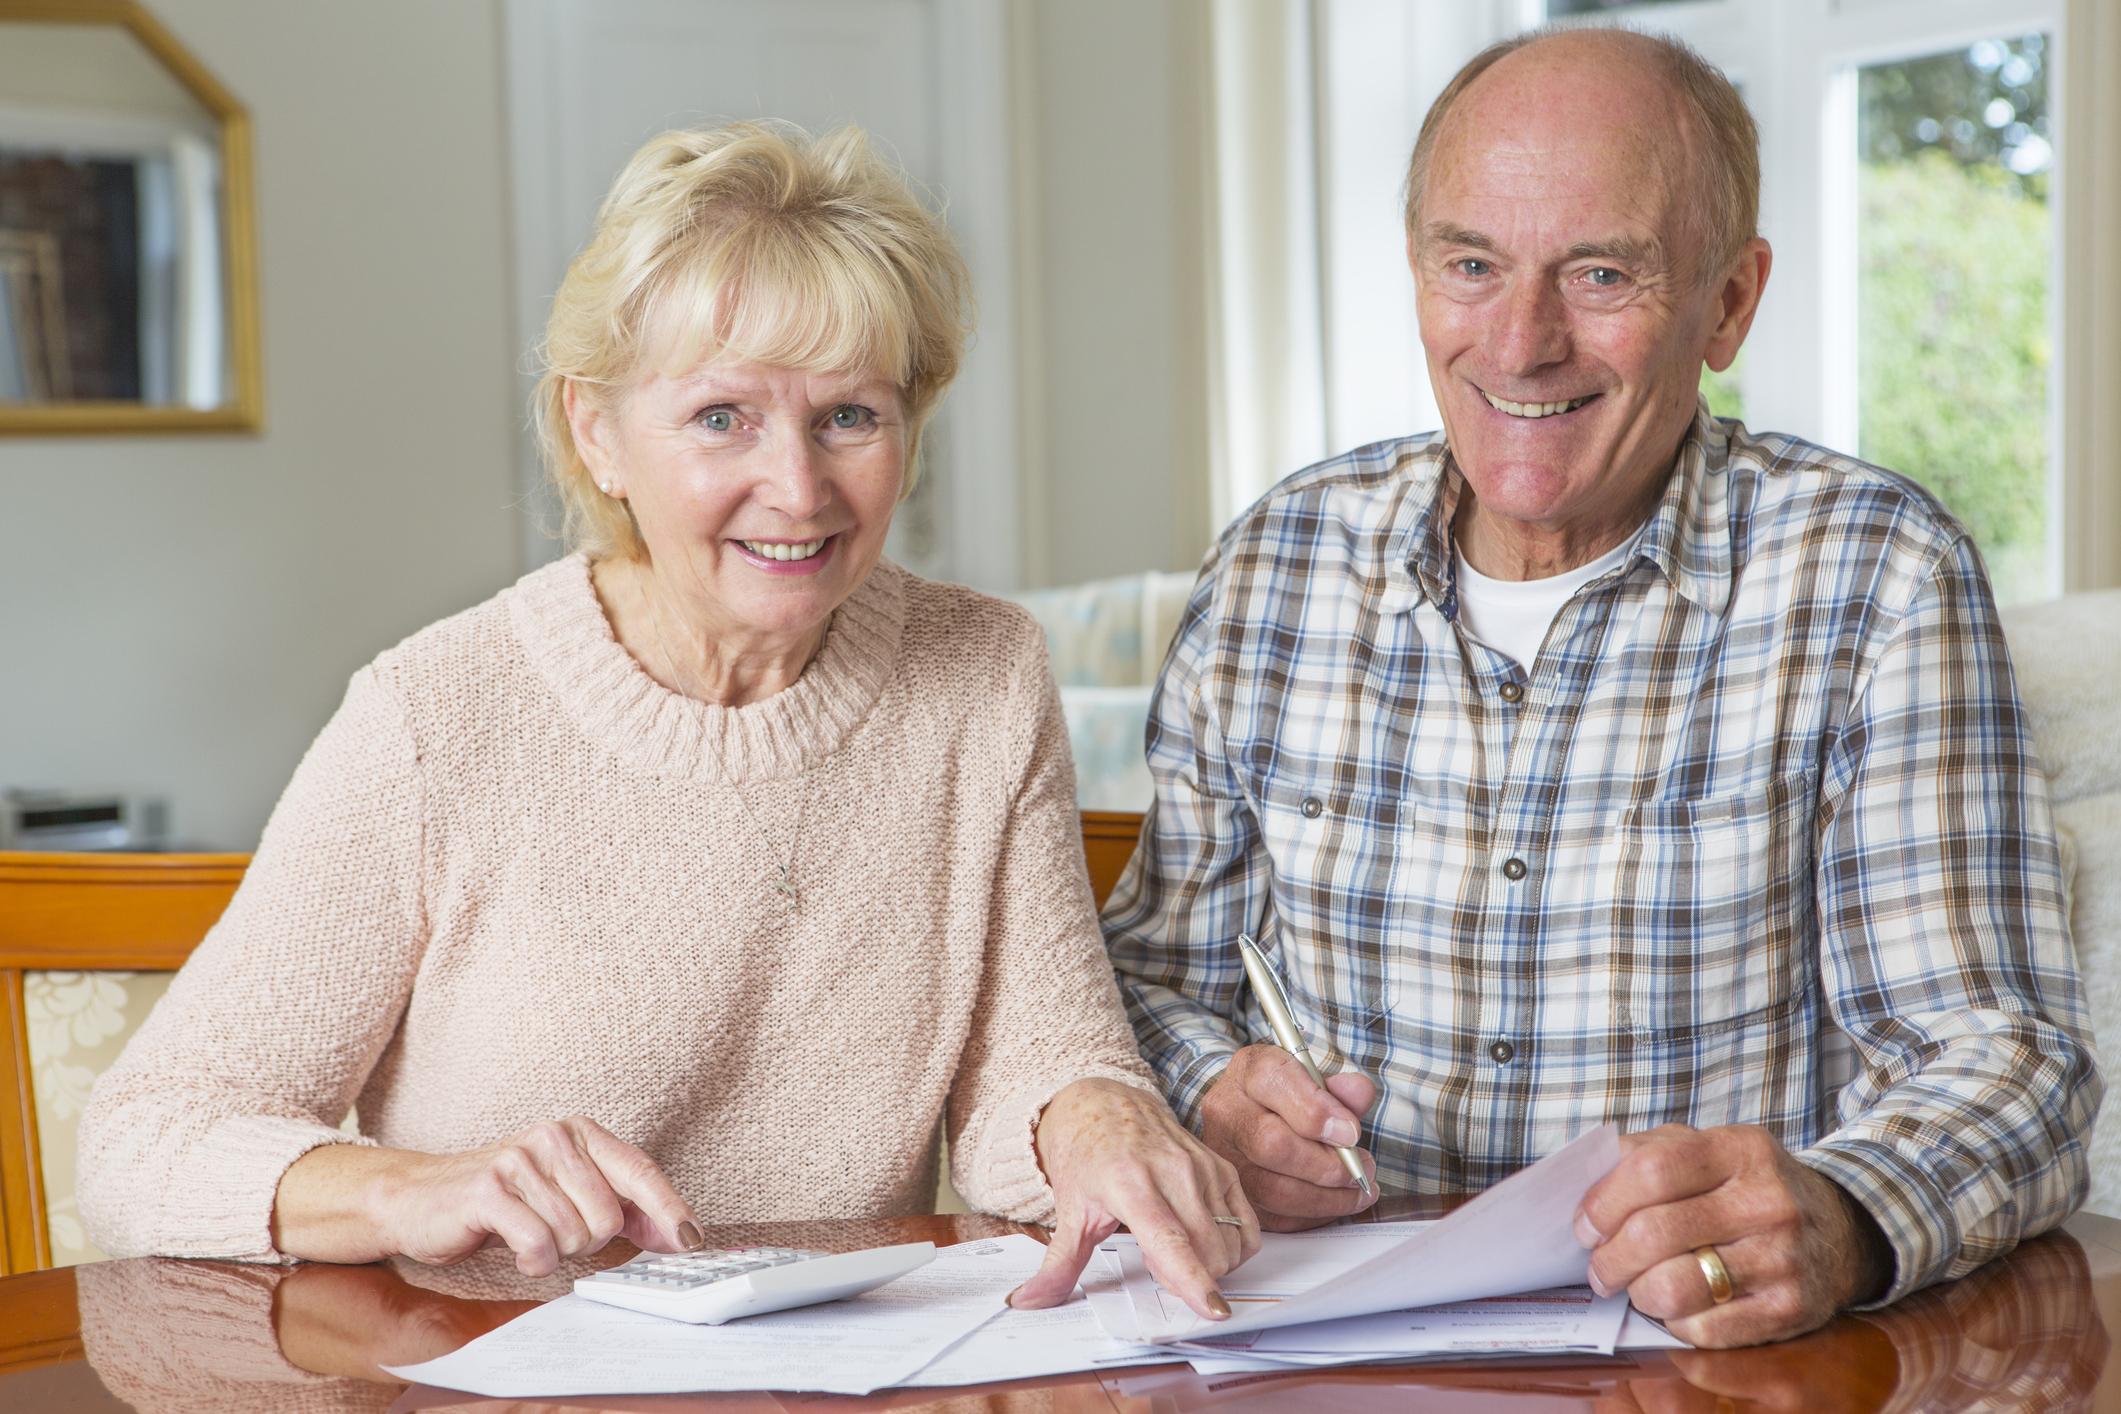 An elderly couple examining their finances.